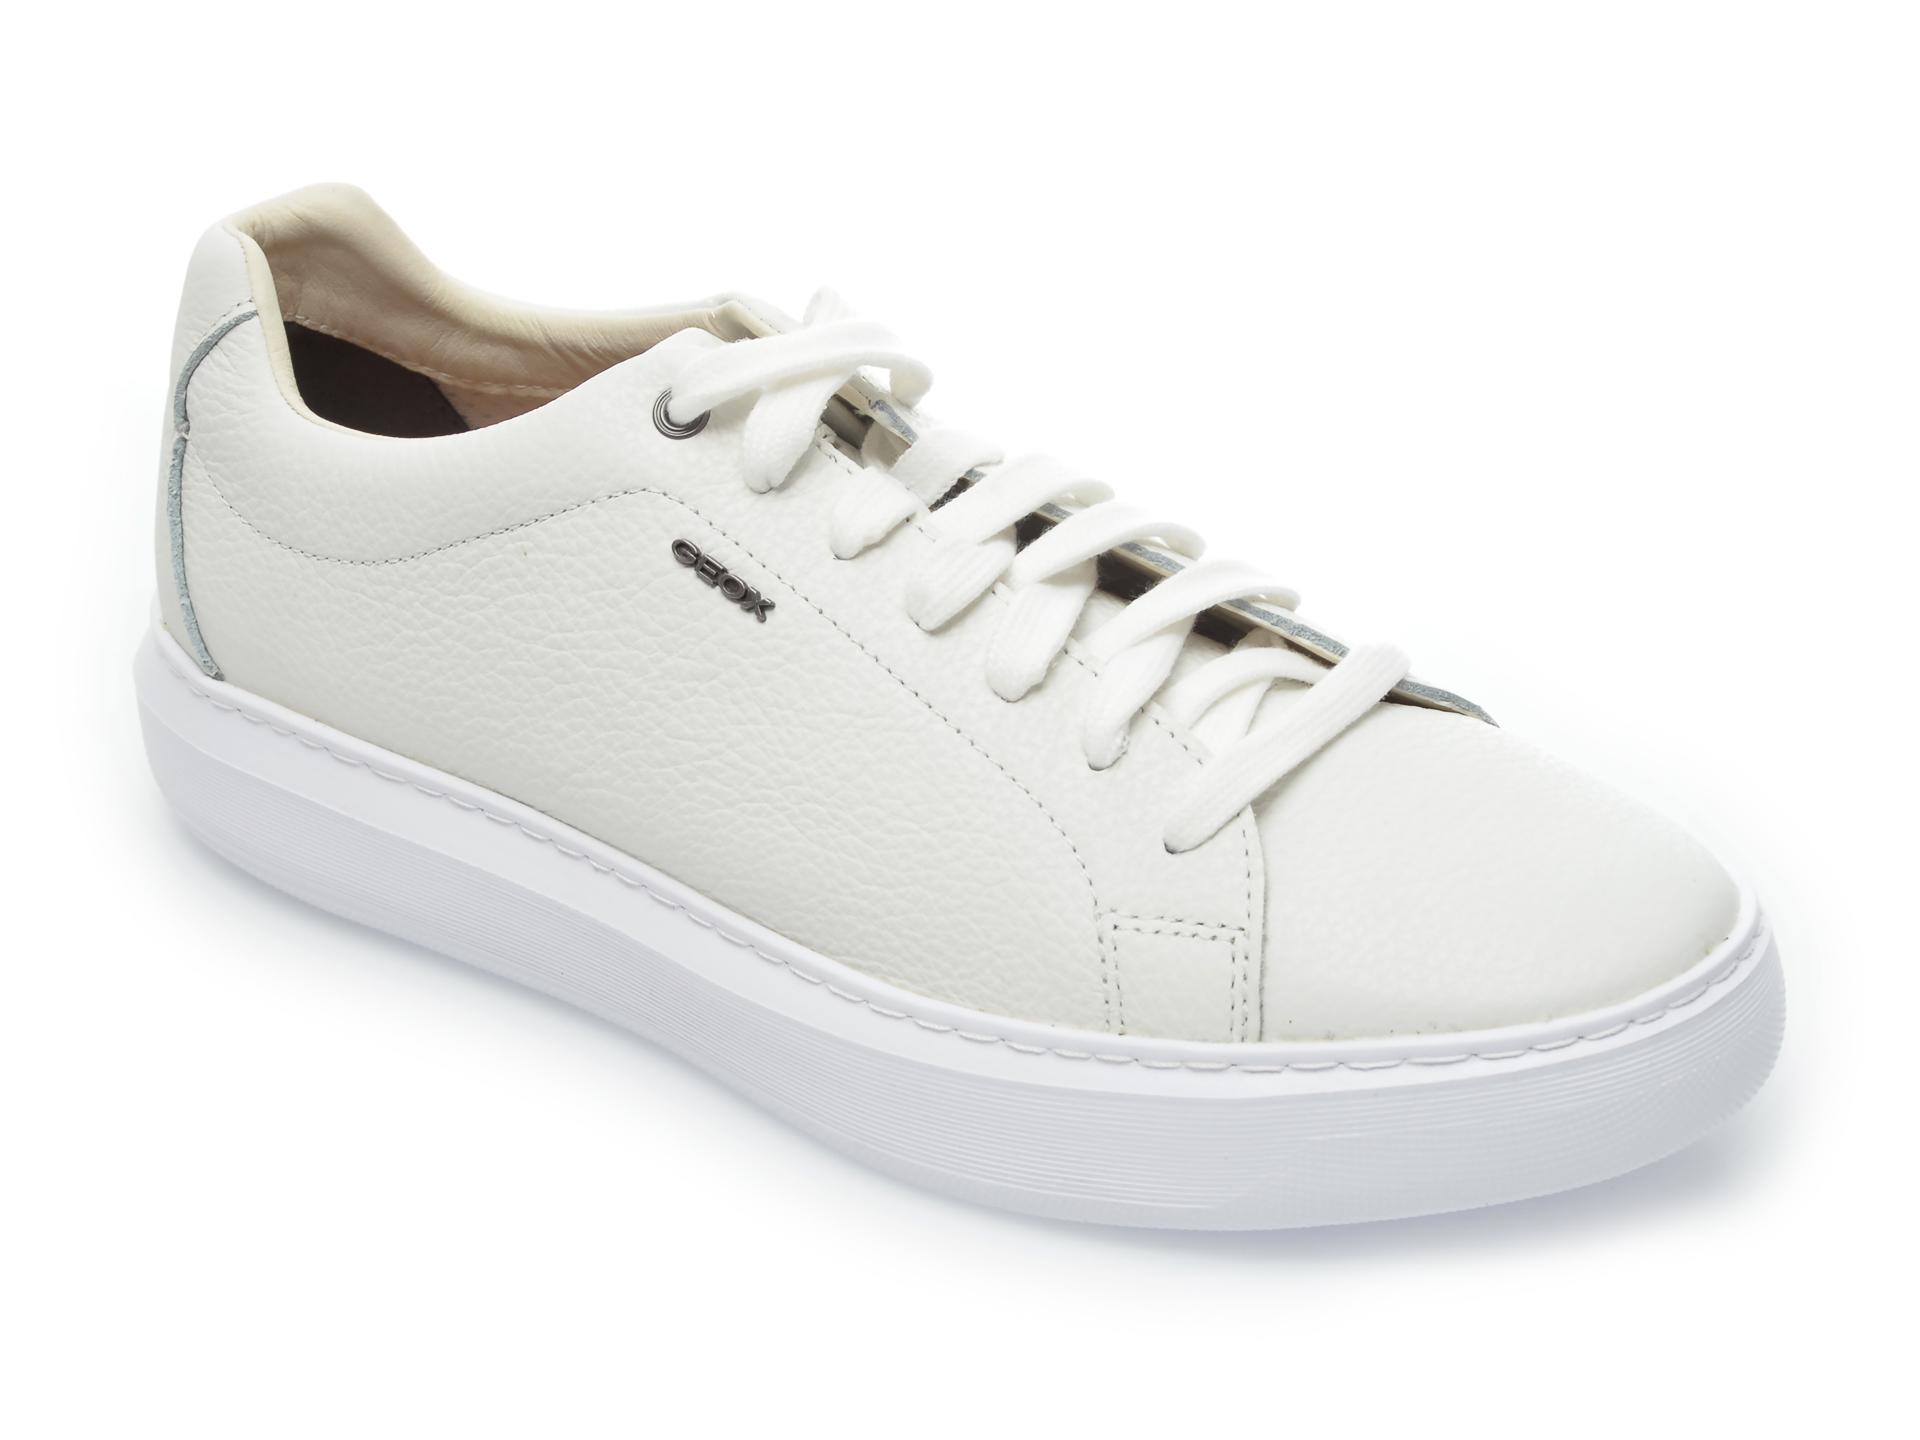 Pantofi sport GEOX albi, U845WB, din piele naturala